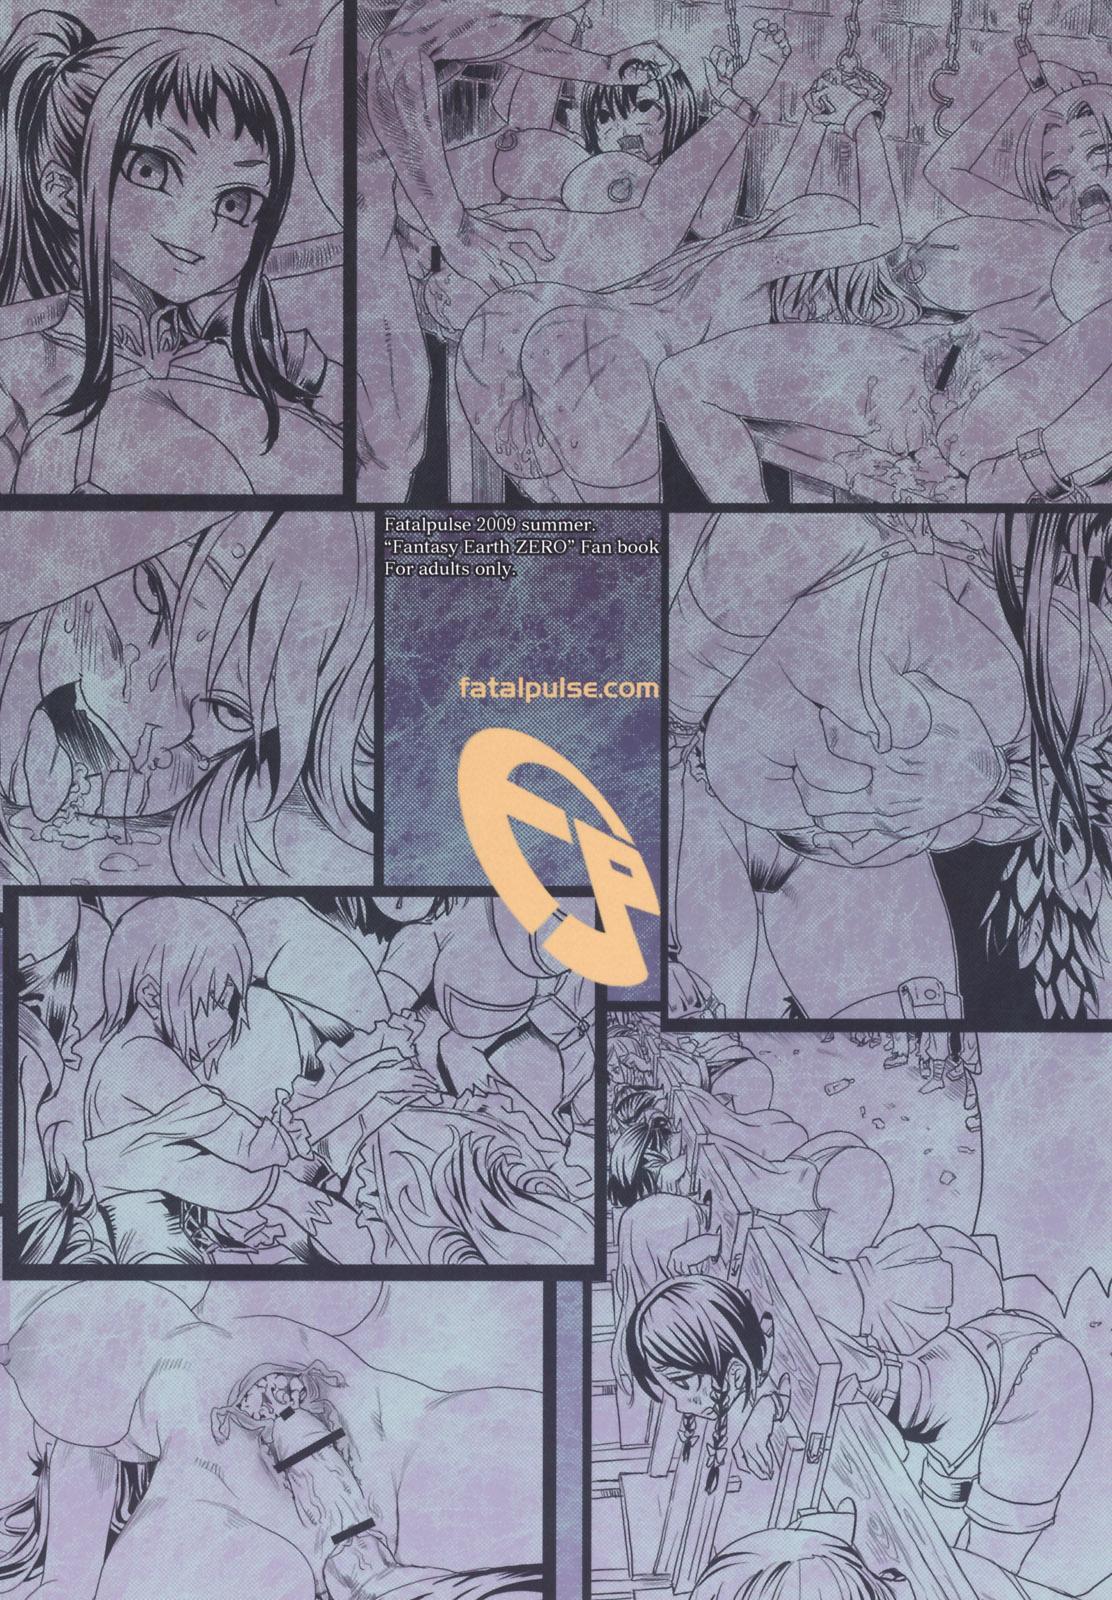 (C76) [Fatalpulse (Asanagi)] Victim Girls 7 - Jaku Niku Kyoushoku Dog-eat-Bitch (Fantasy Earth Zero) [English] [desudesu] 41